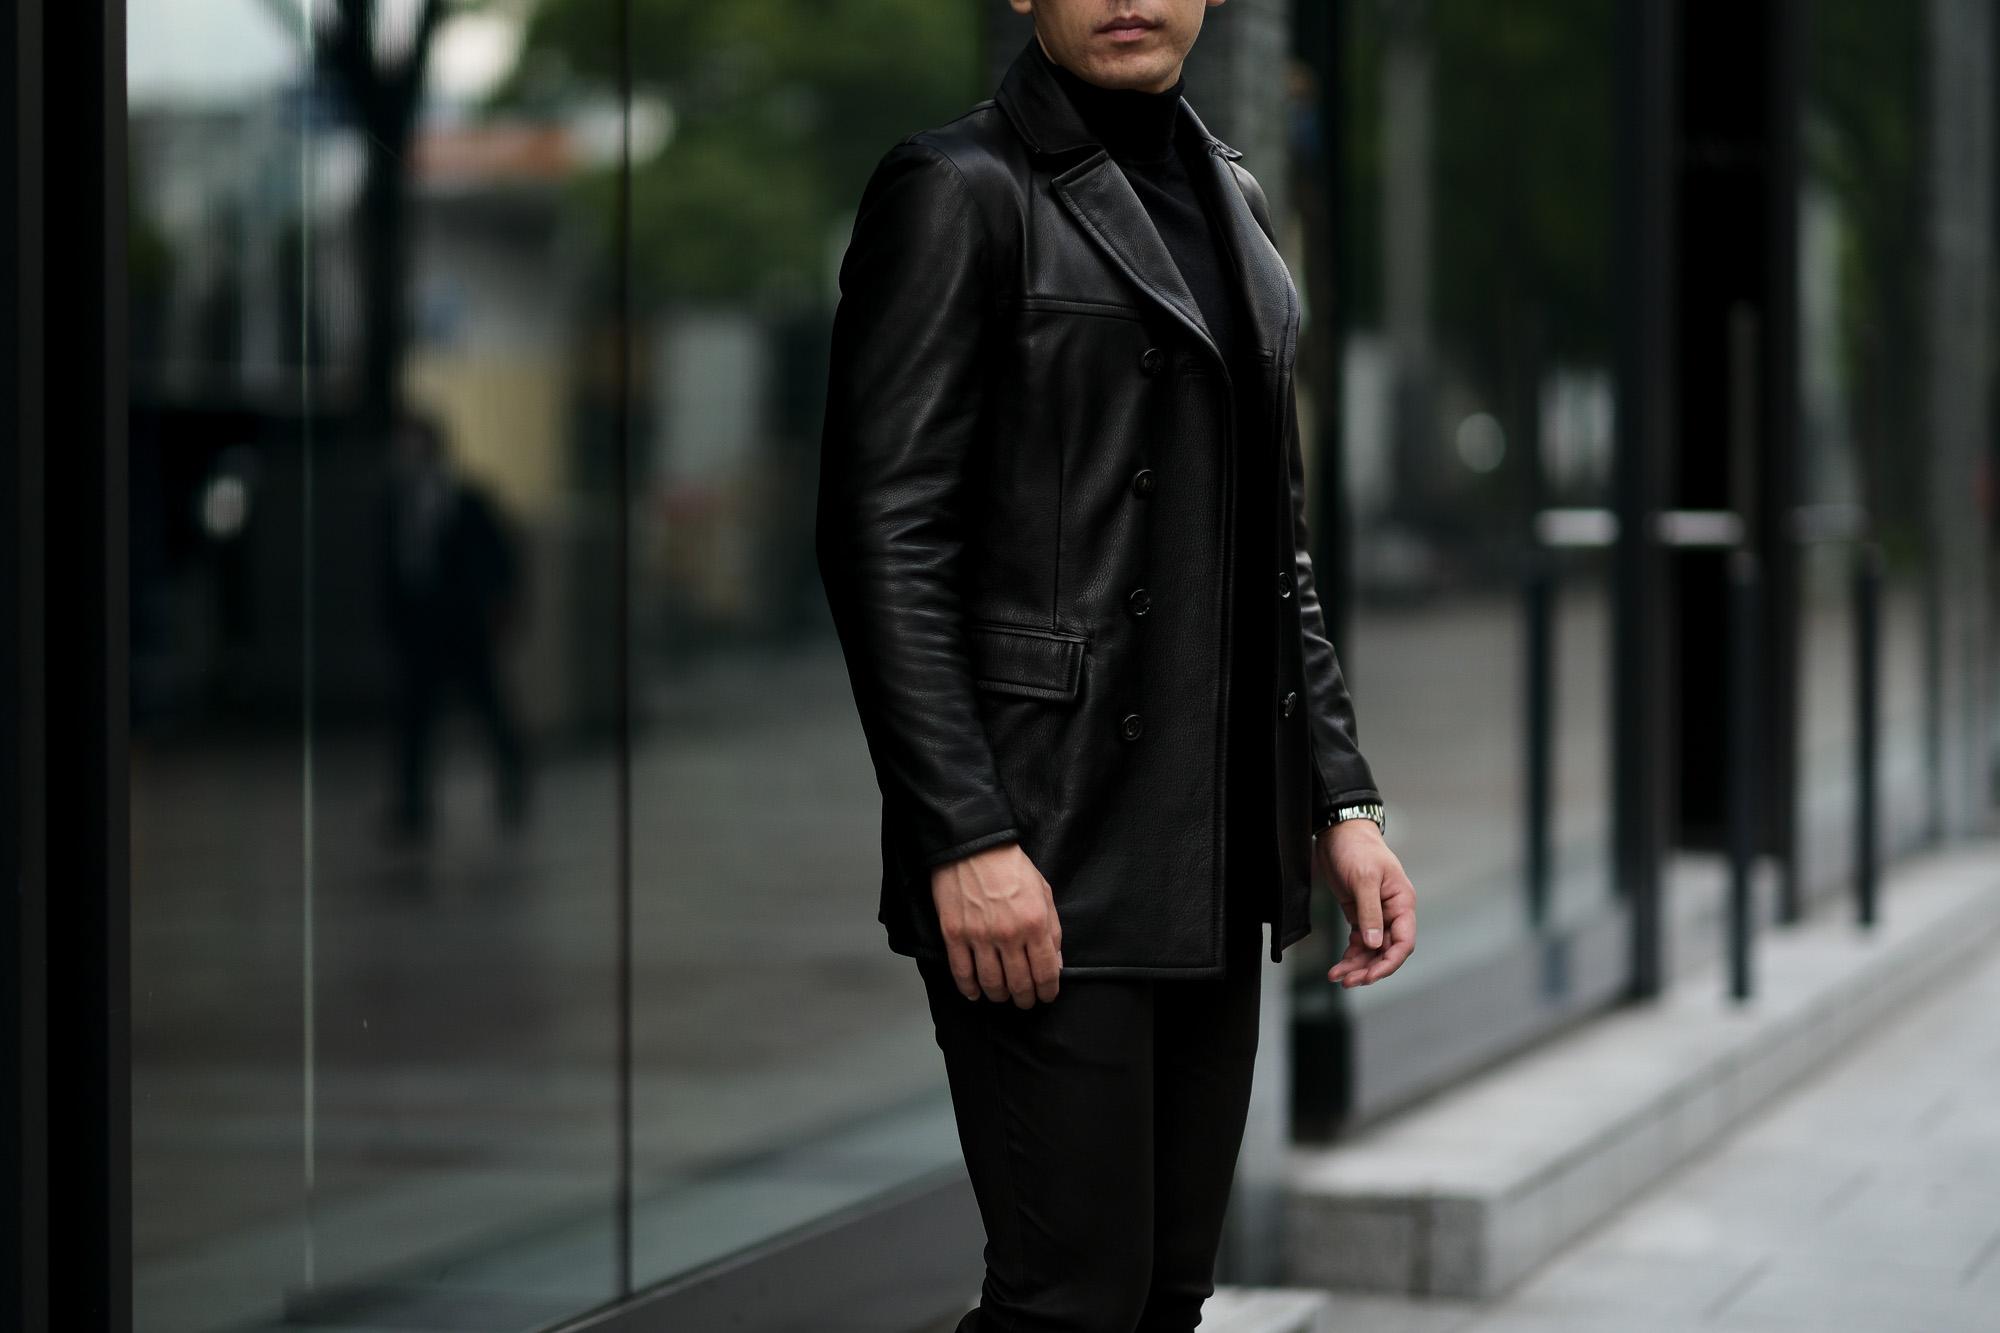 cuervo bopoha (クエルボ ヴァローナ) Satisfaction Leather Collection (サティスファクション レザー コレクション) Vincent (ヴィンセント) BUFFALO LEATHER (バッファロー レザー) レザー Pコート BLACK (ブラック) MADE IN JAPAN (日本製) 2020秋冬 【入荷しました】【SOLD OUT】愛知 名古屋 Alto e Diritto altoediritto アルトエデリット